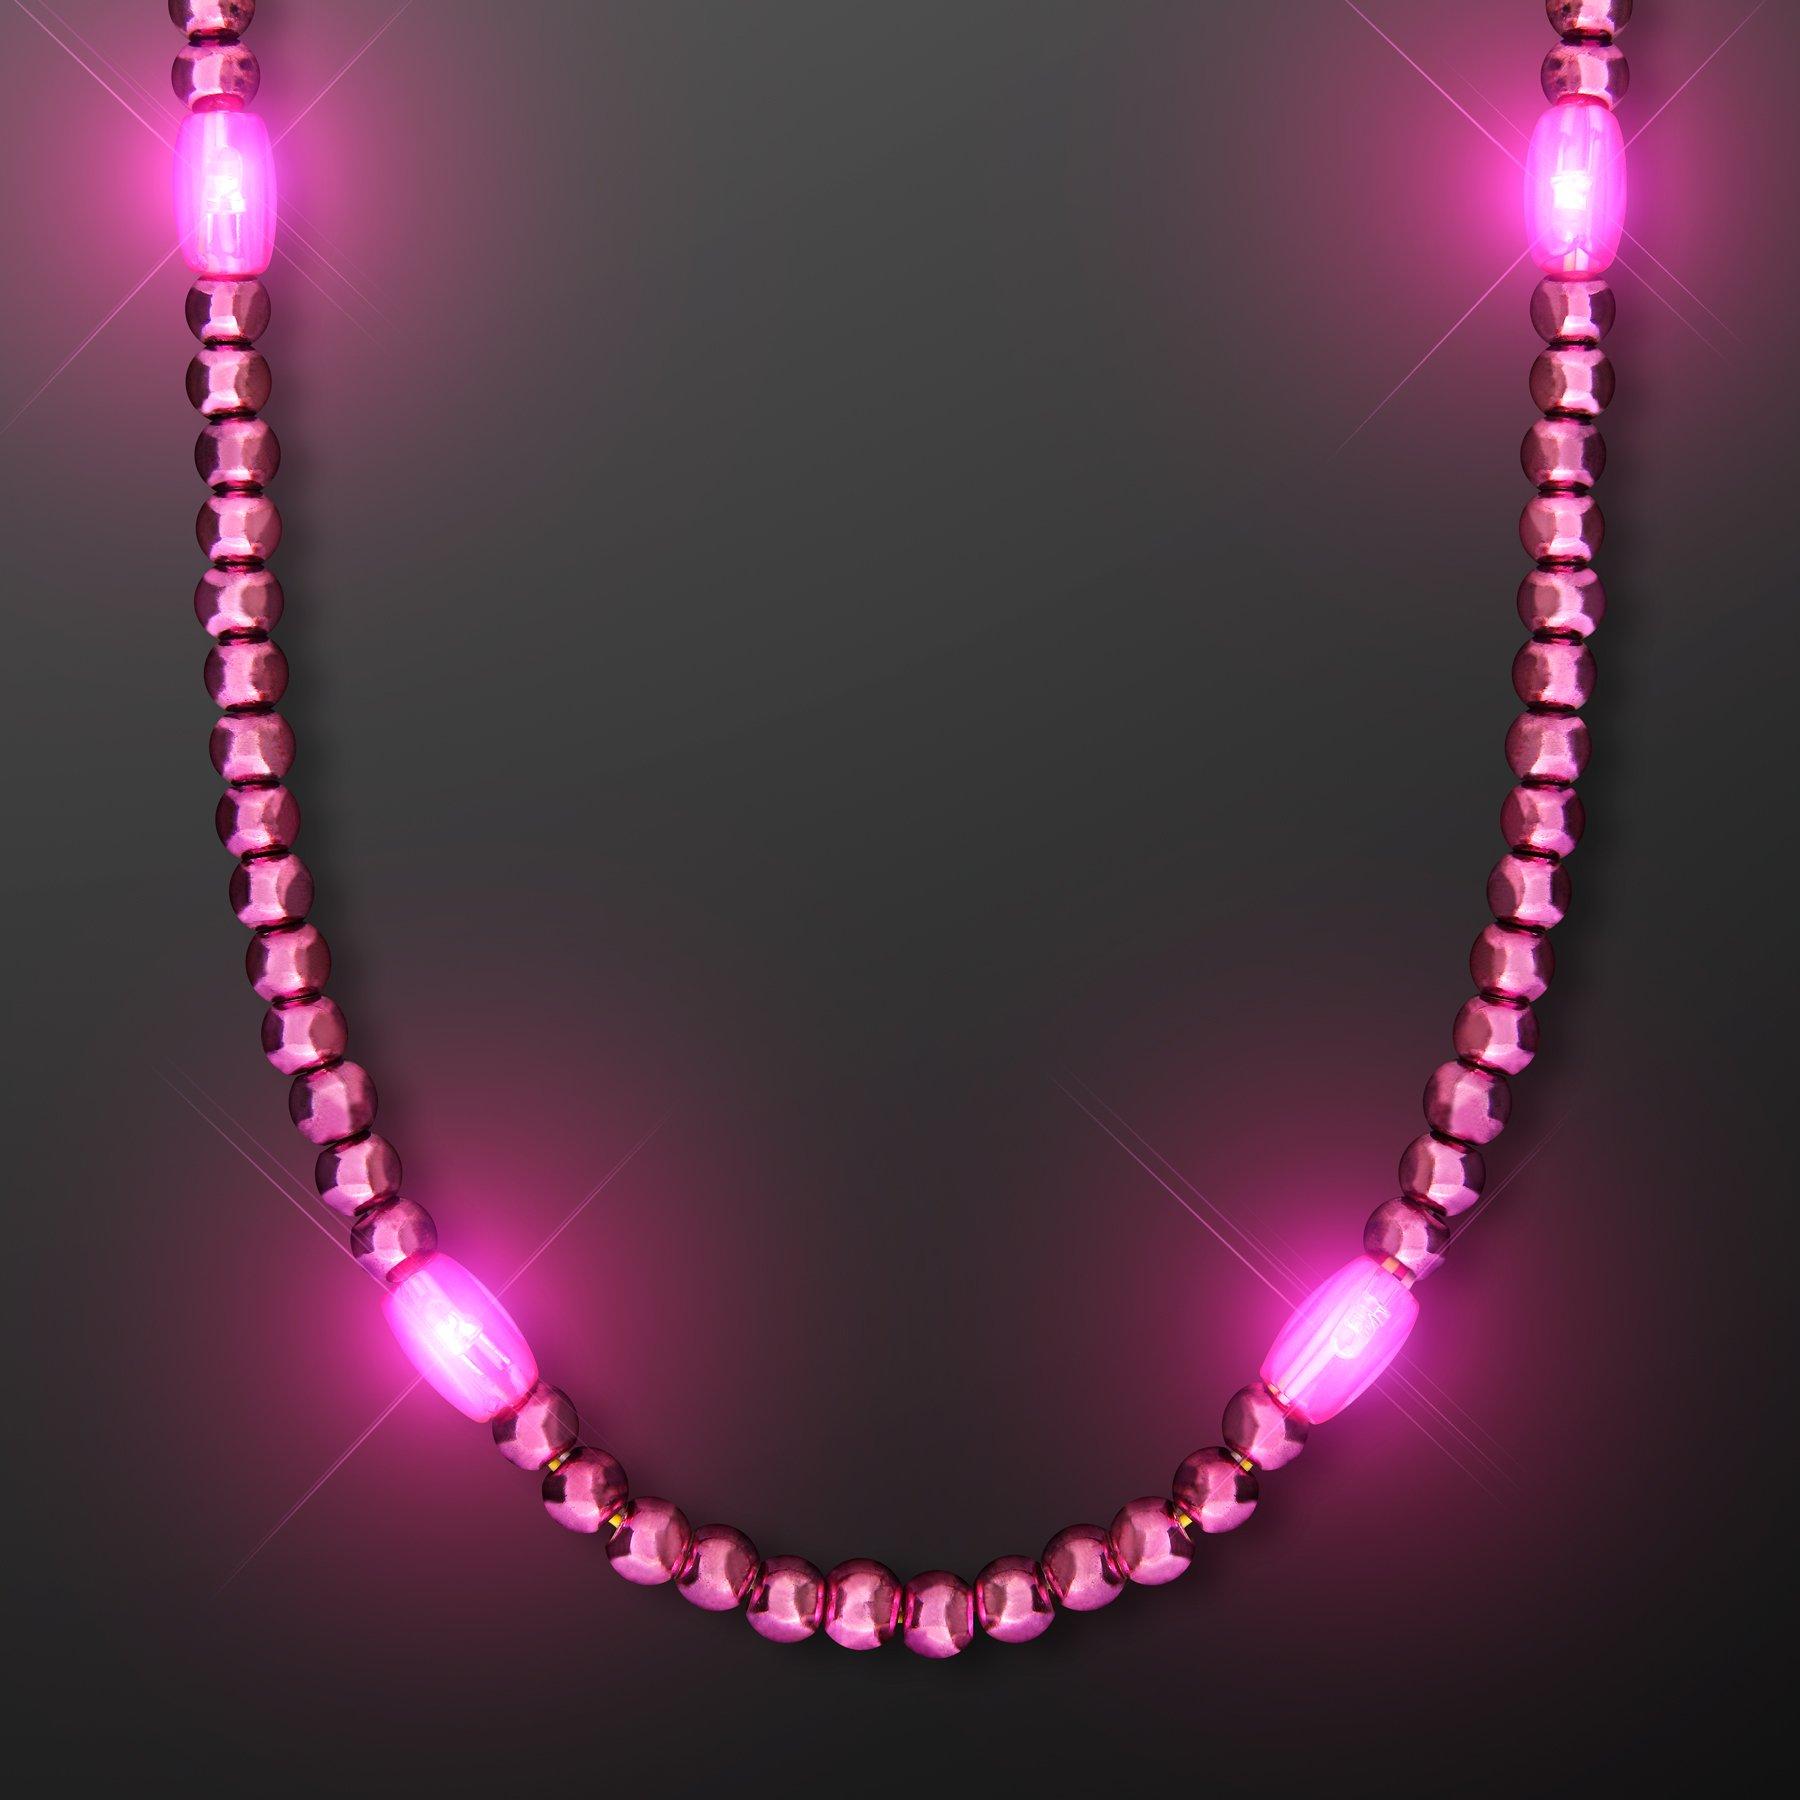 FlashingBlinkyLights Pink Light Up LED Mardi Gras Bead Necklaces (Set of 12) by FlashingBlinkyLights (Image #1)